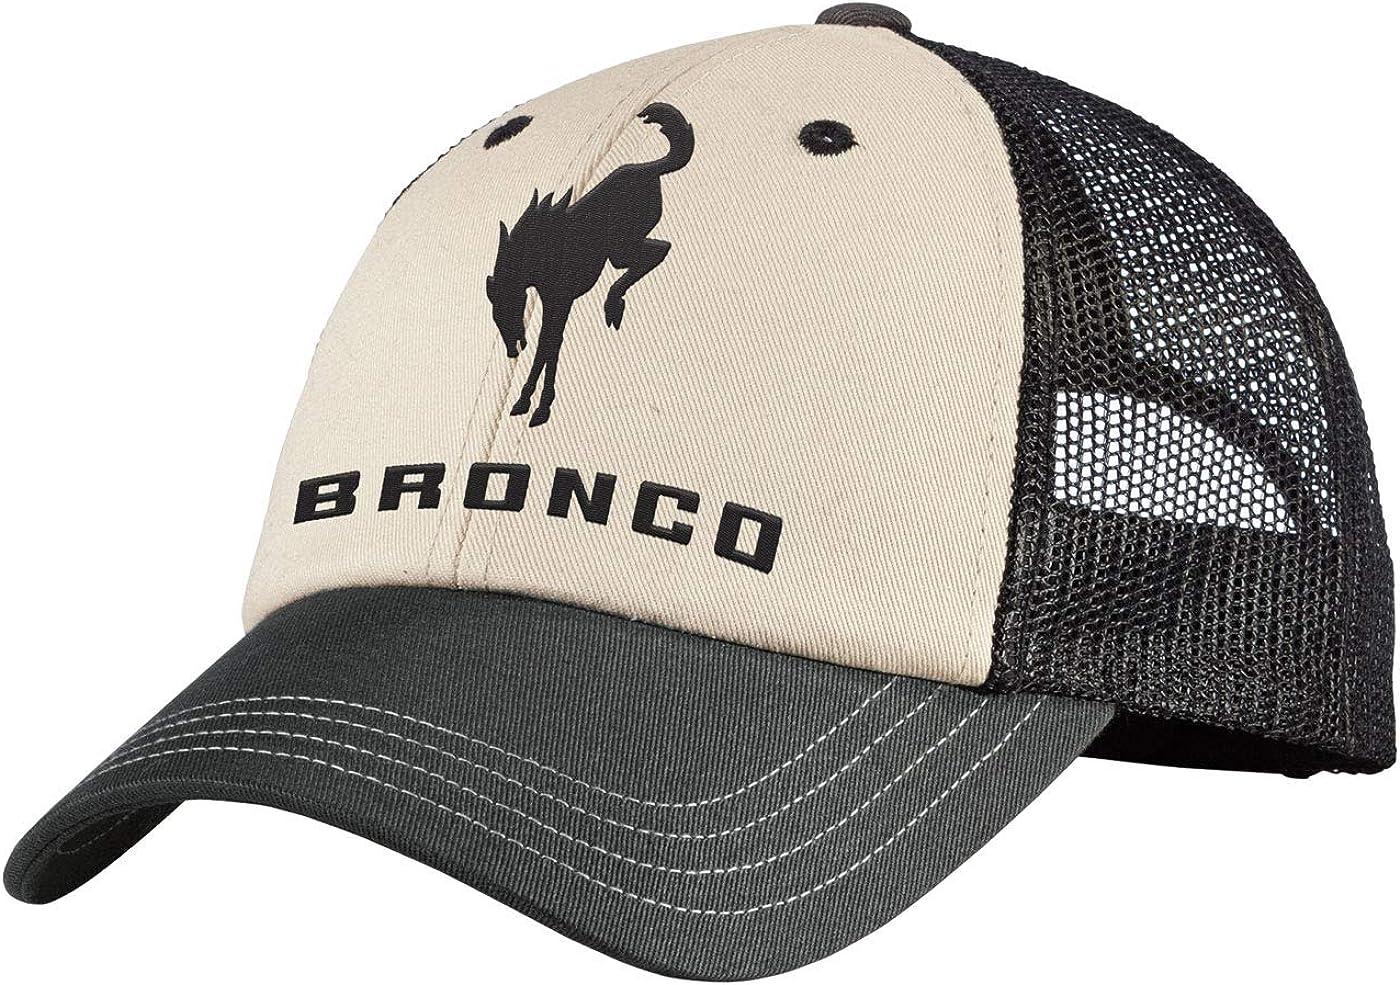 Ford Bronco Tri-Tone Mesh Back Cap